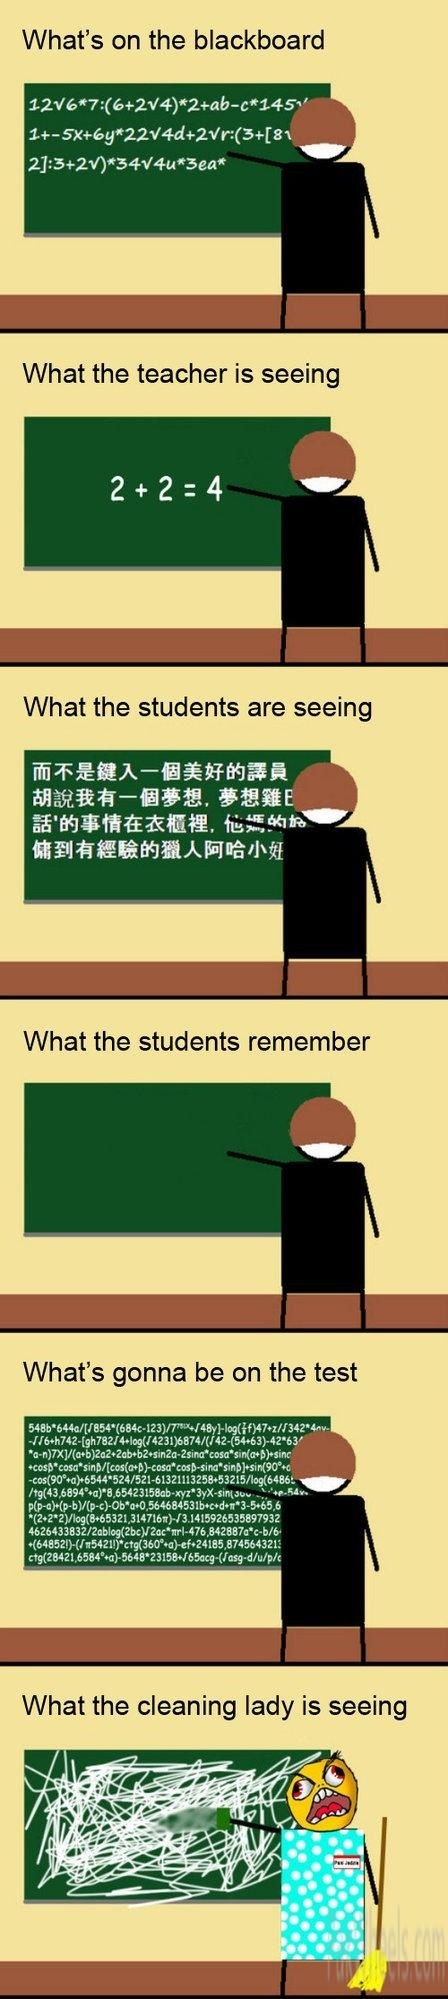 What's On The Blackboard